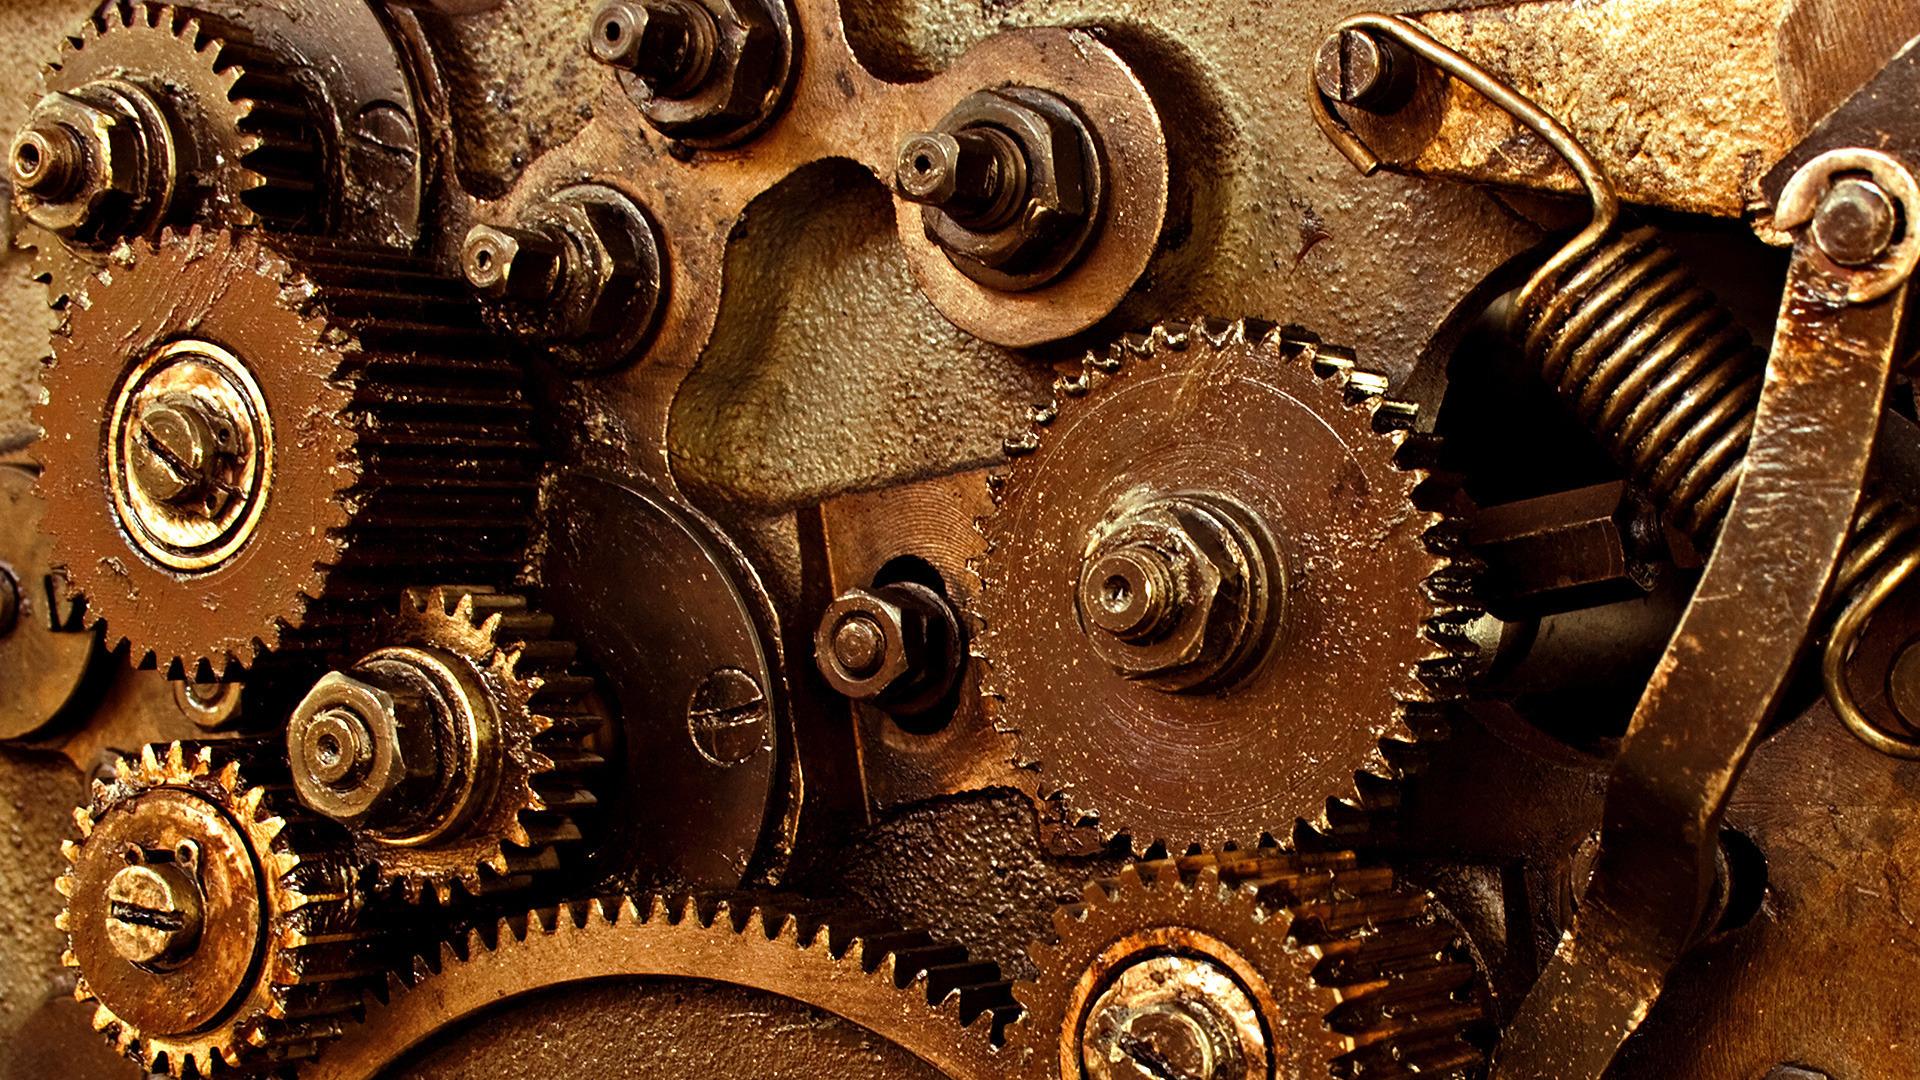 Machine Wallpaper 11797